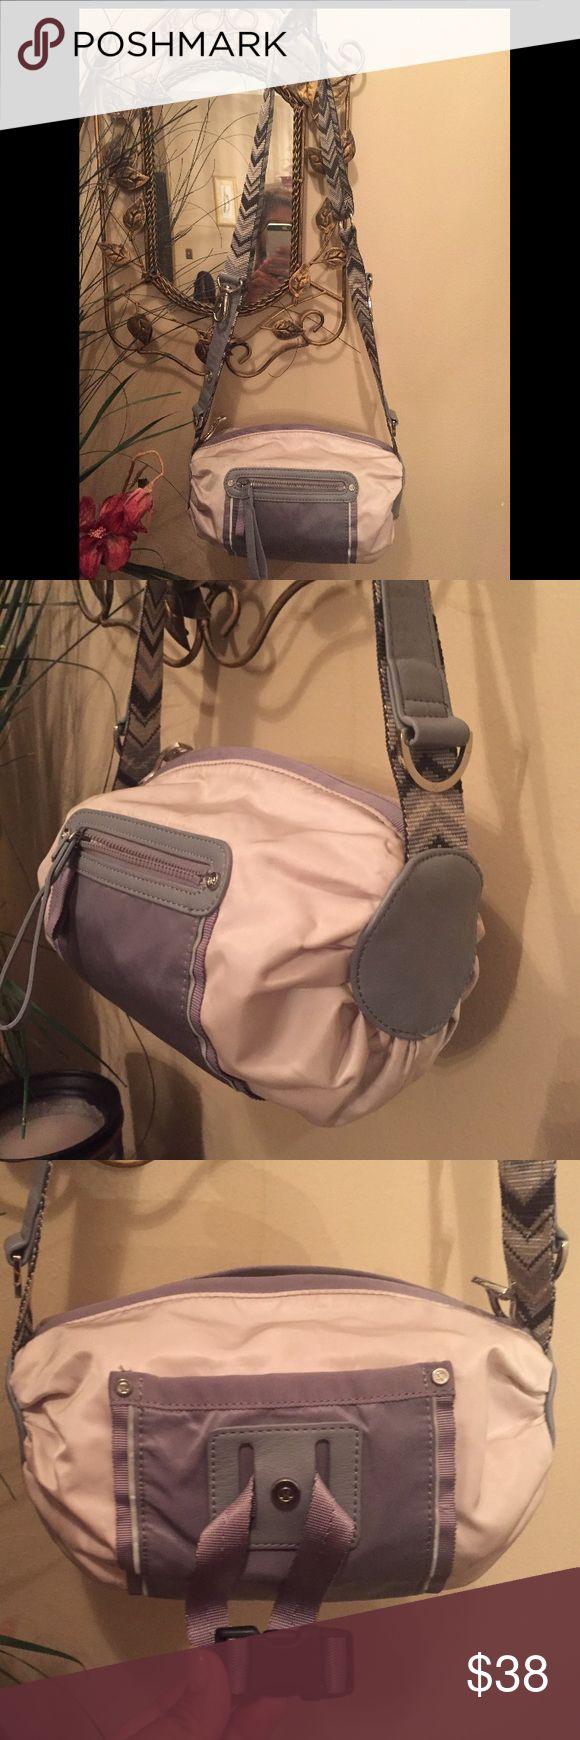 LULULEMON BAG Pre-owned LULULEMON Bag. Gray/bone color. Zipper closure, mesh pocket inside, pocket located in front and back. Adjustable strap. Slight exterior wear, though bag in great condition. lululemon athletica Bags Crossbody Bags